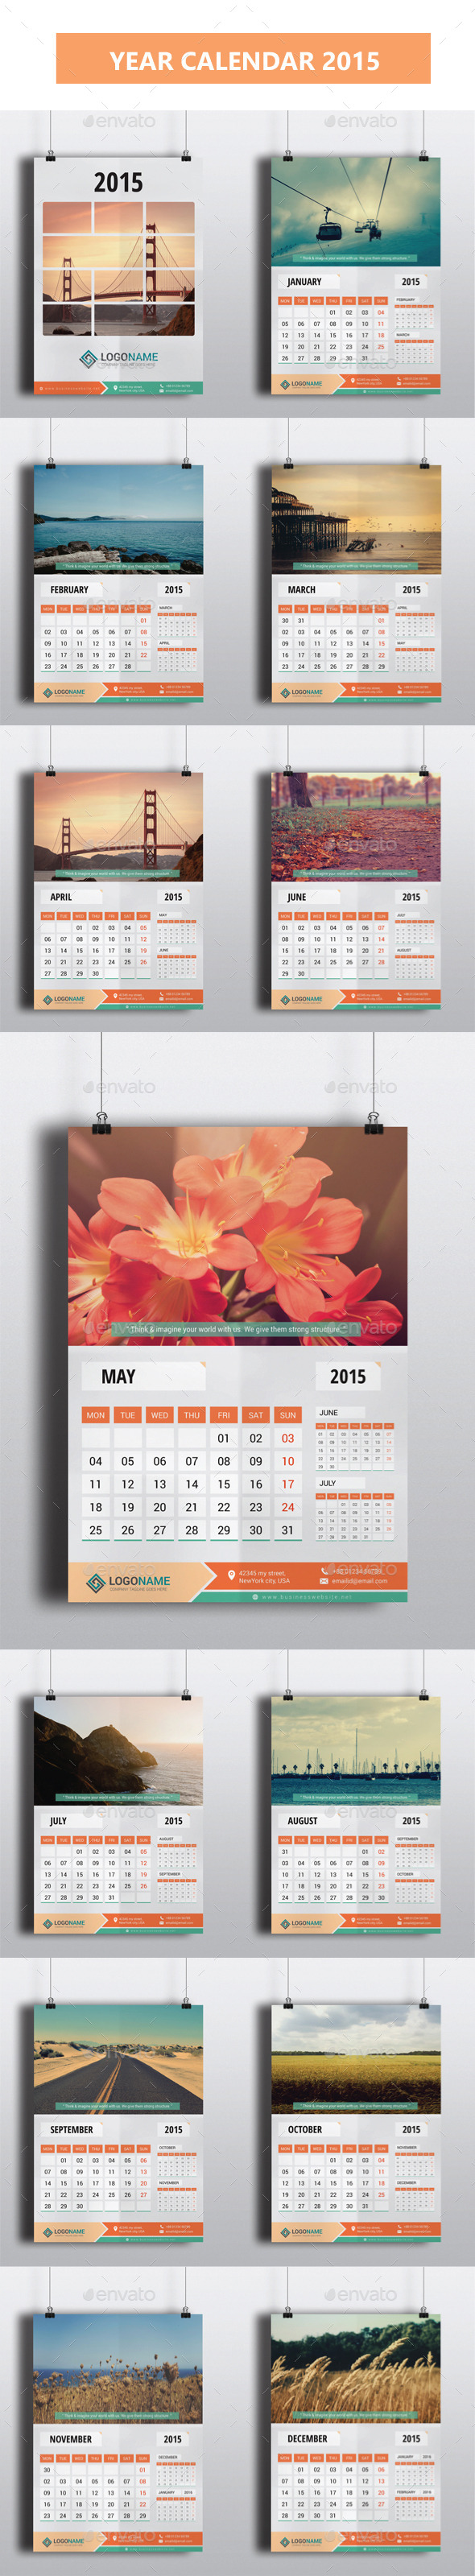 Year Calendar 2015 - Calendars Stationery